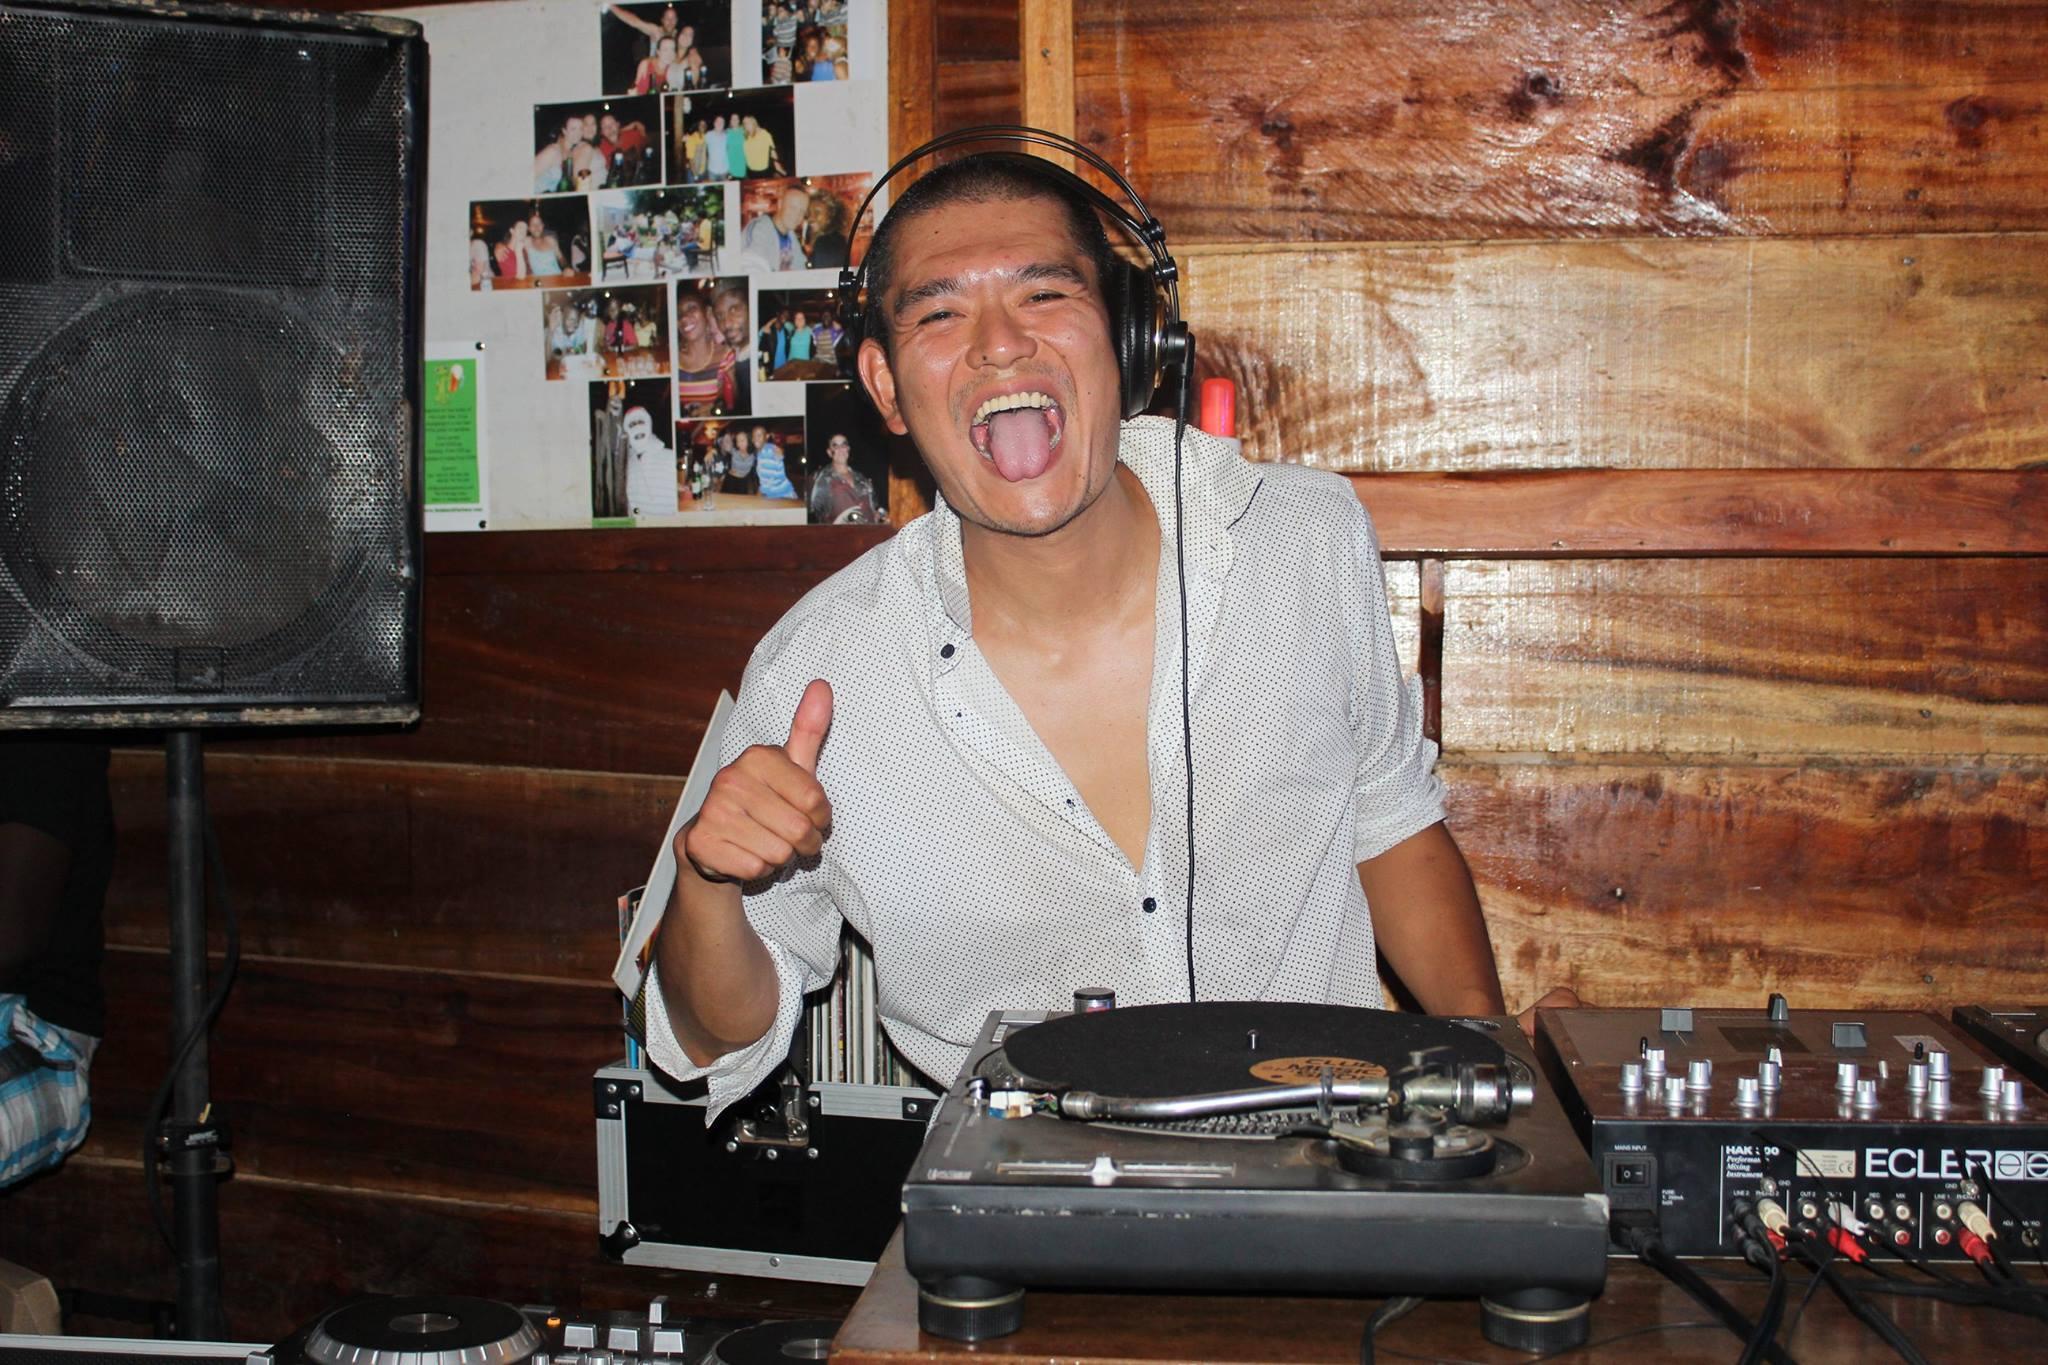 DJ salut